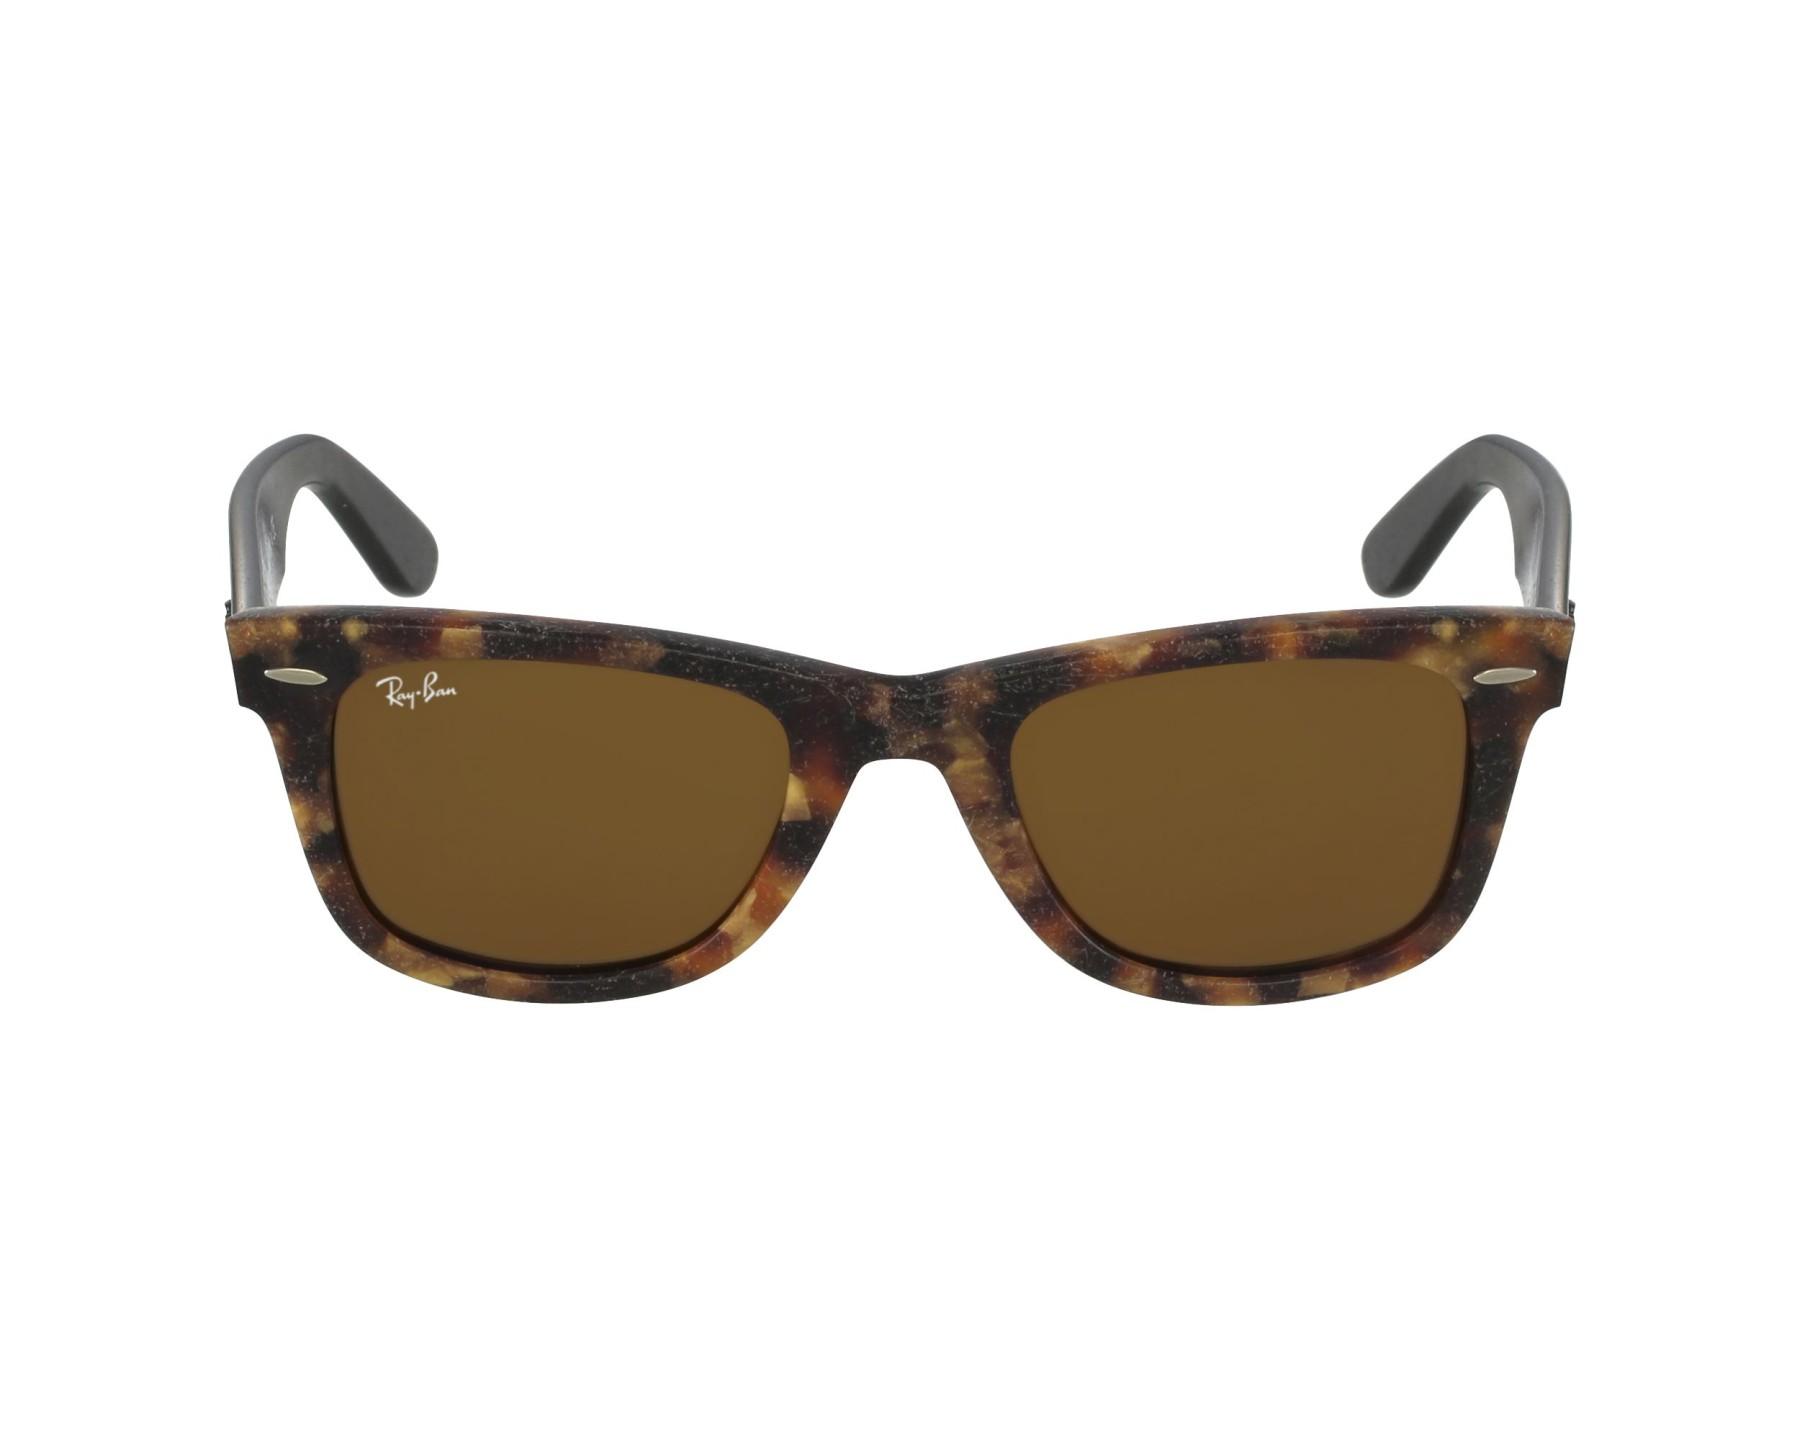 lunettes de soleil ray ban rb 2140 1187 havane avec des verres marron. Black Bedroom Furniture Sets. Home Design Ideas